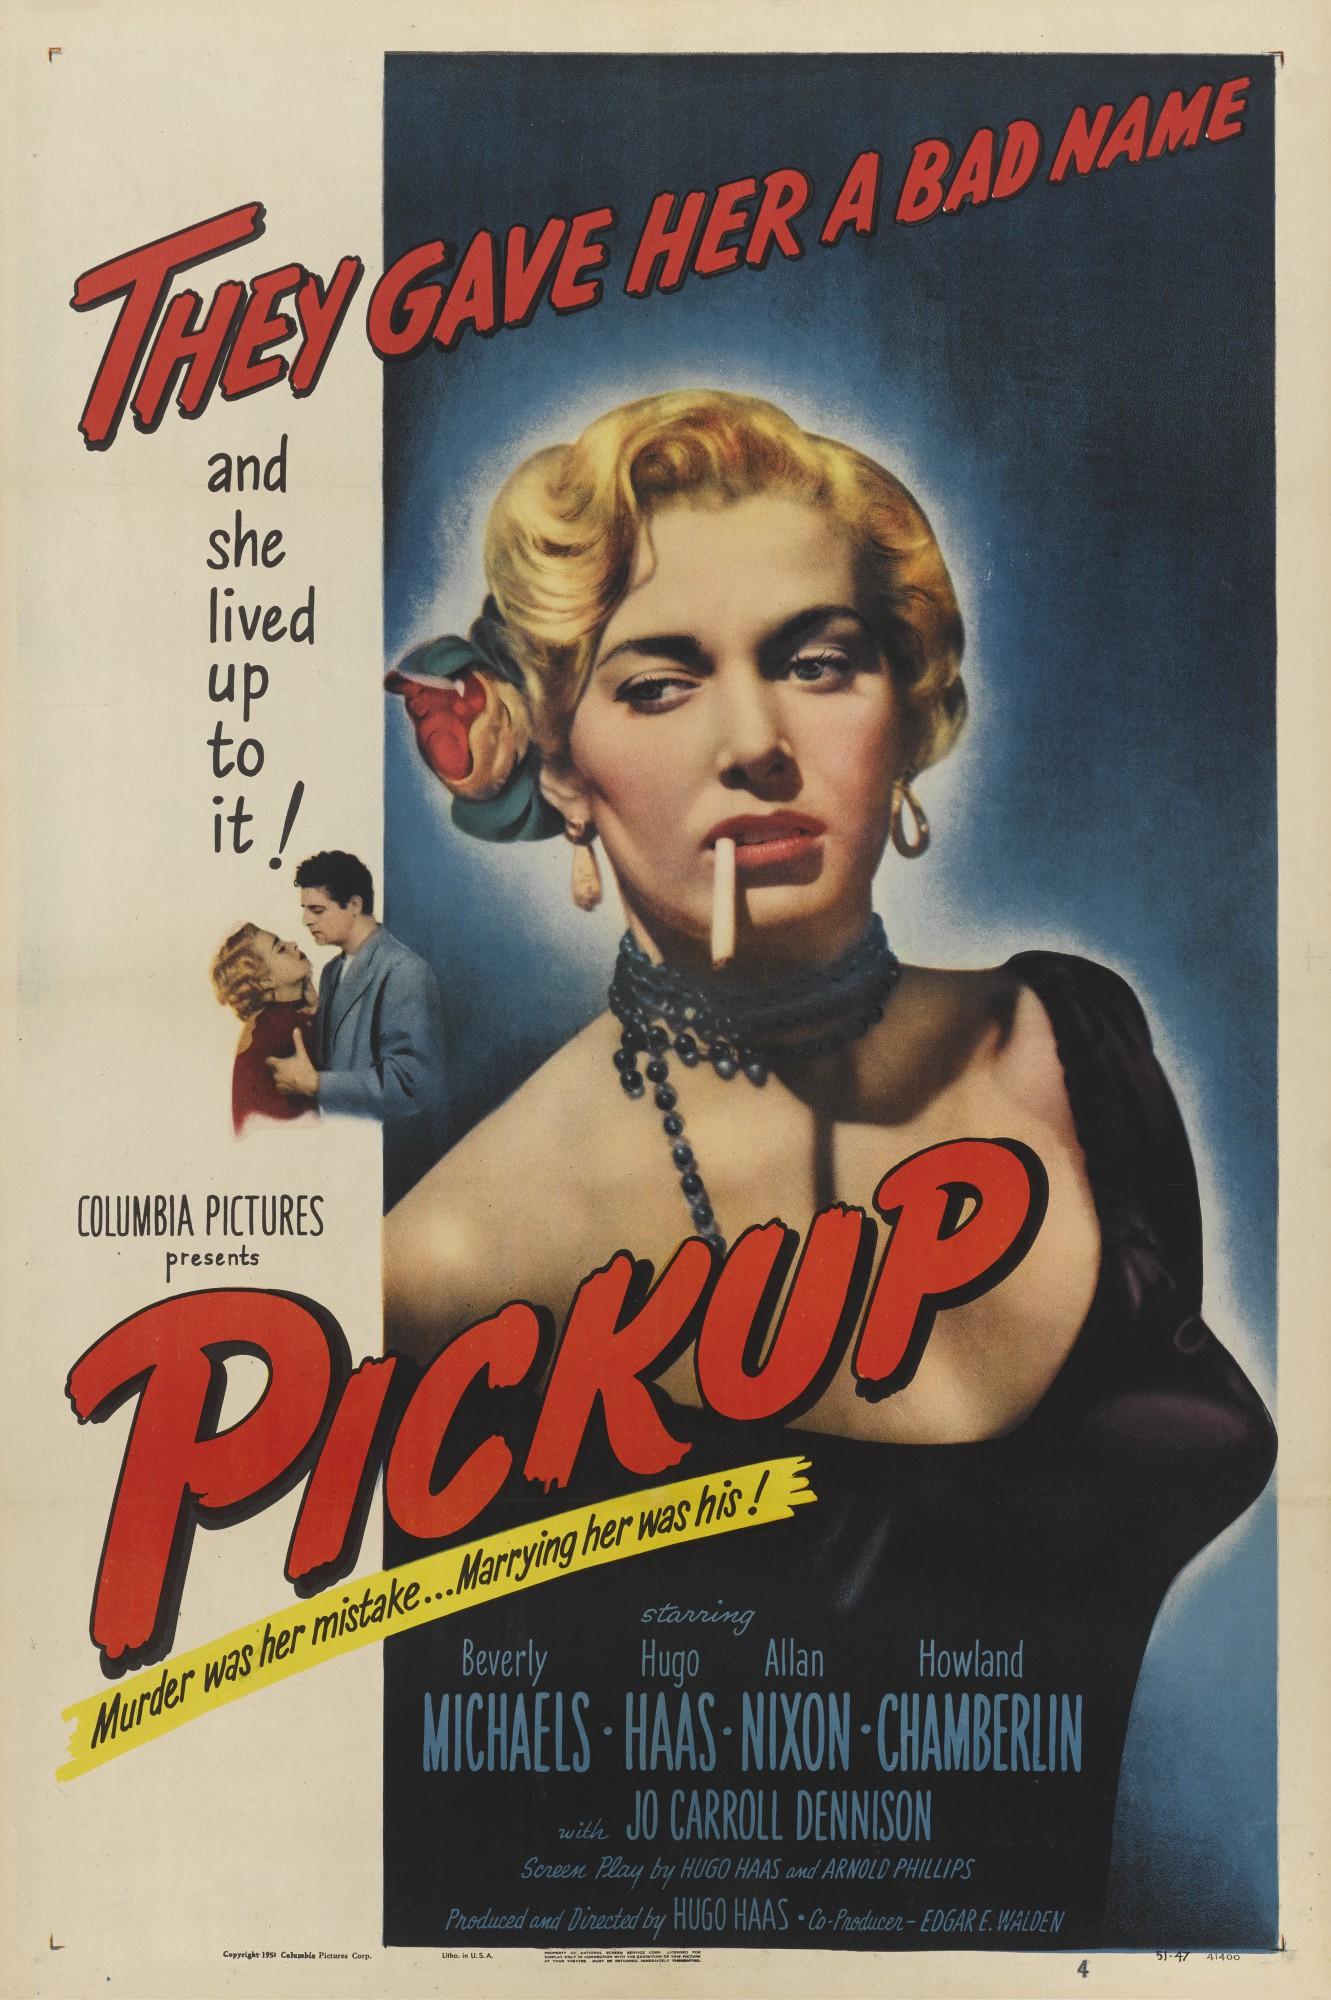 PICKUP (1951) POSTER, US